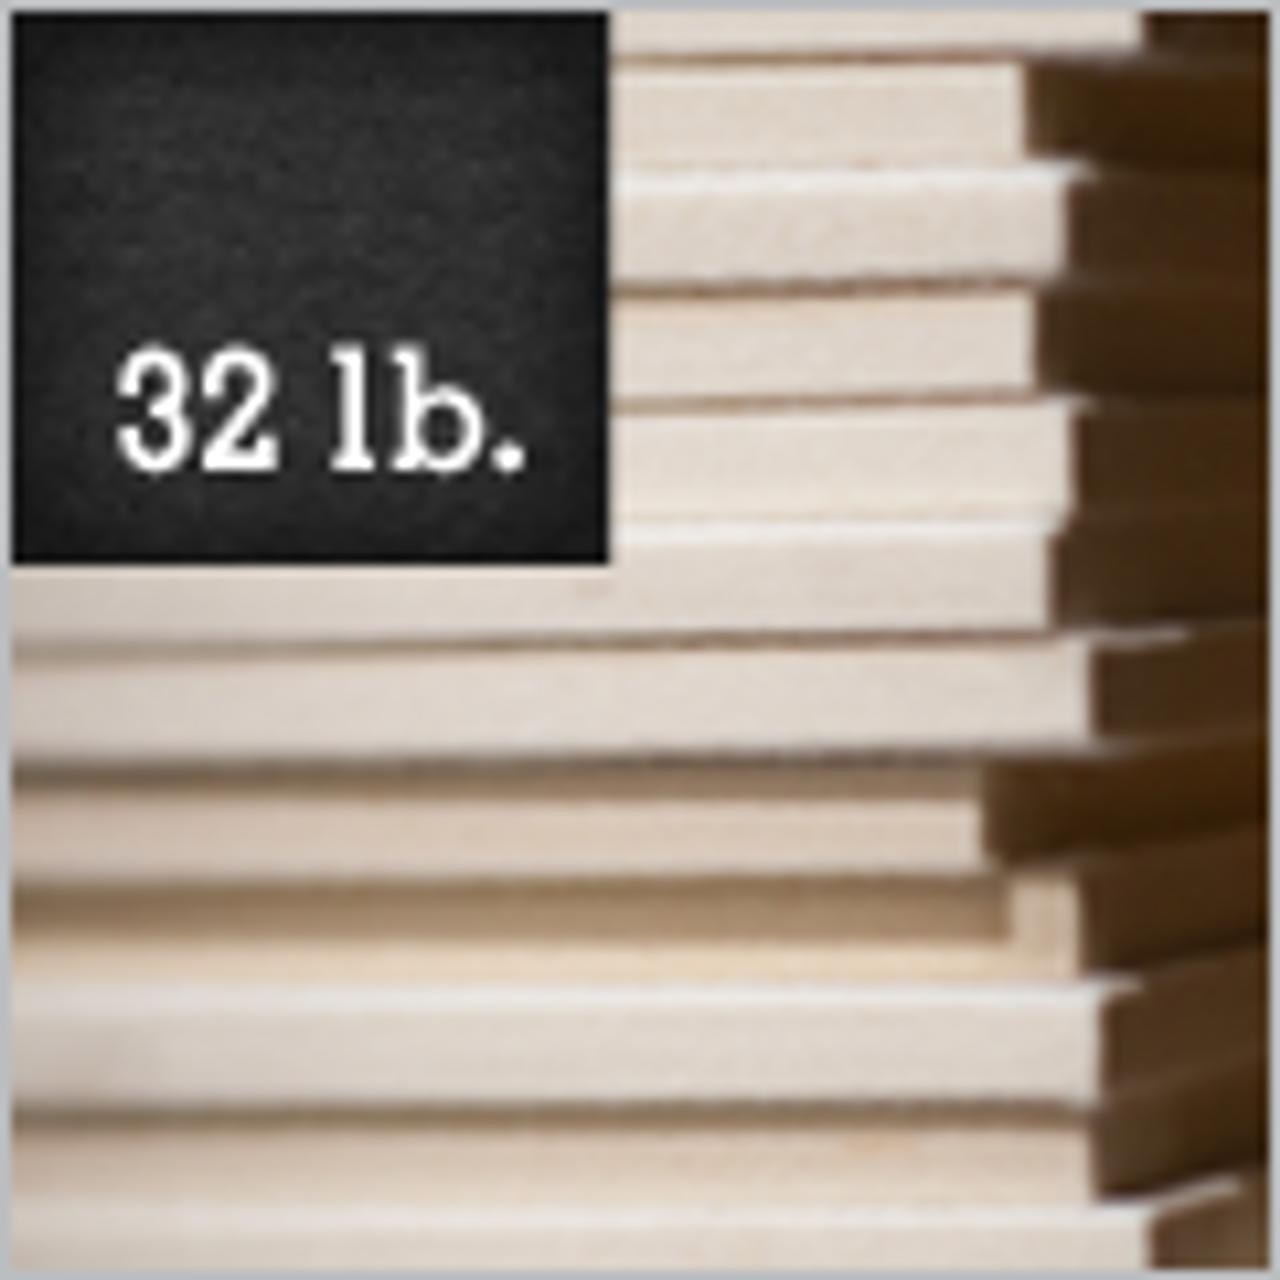 32 lb. Sheet Felt, High Density